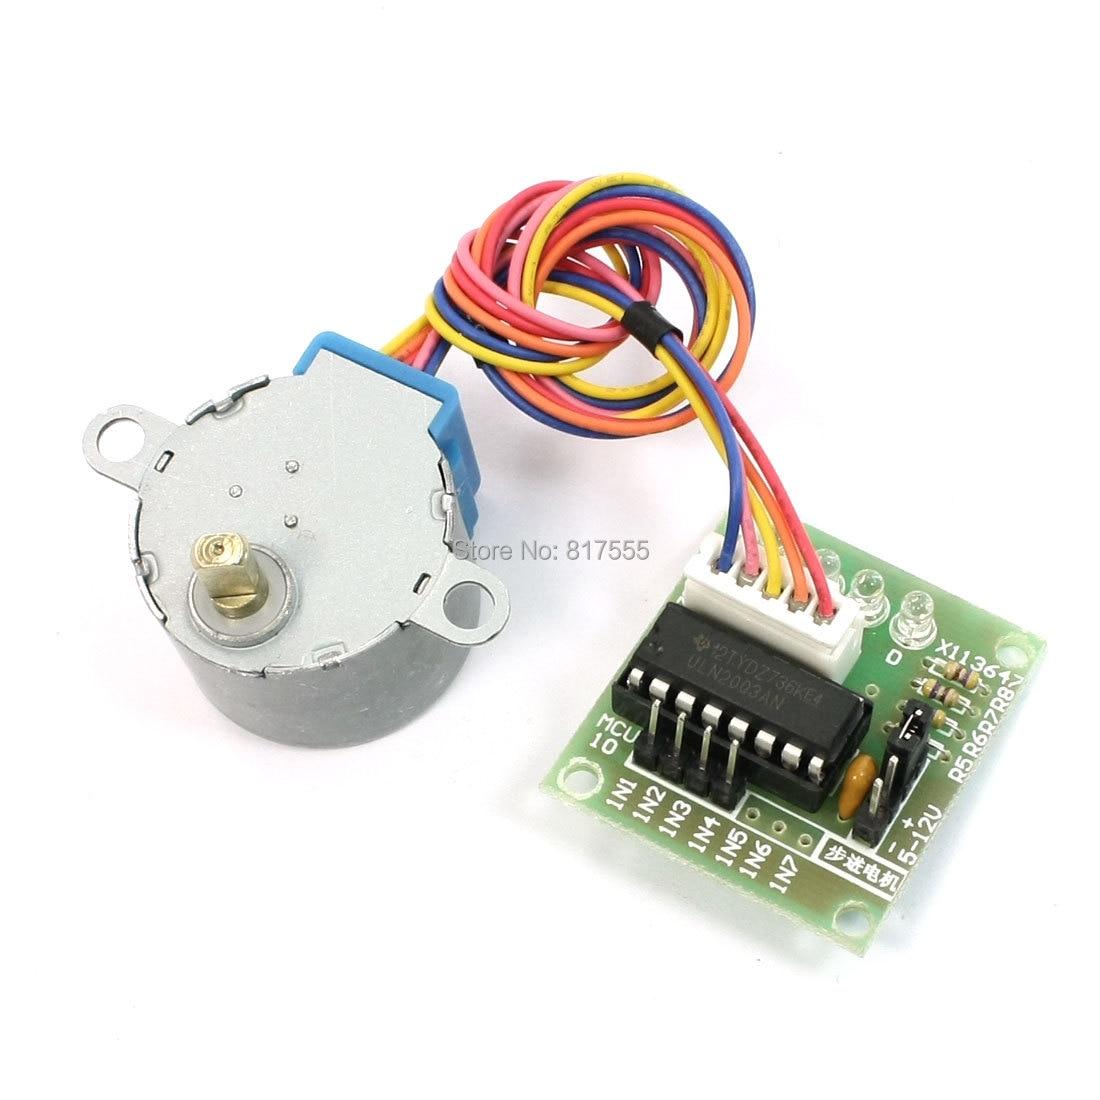 medium resolution of mcu diy 4 phase 5 wires stepper motor 5v with ul2003 driver board stepper motor wiring 4 stepper motor wiring 5 wire